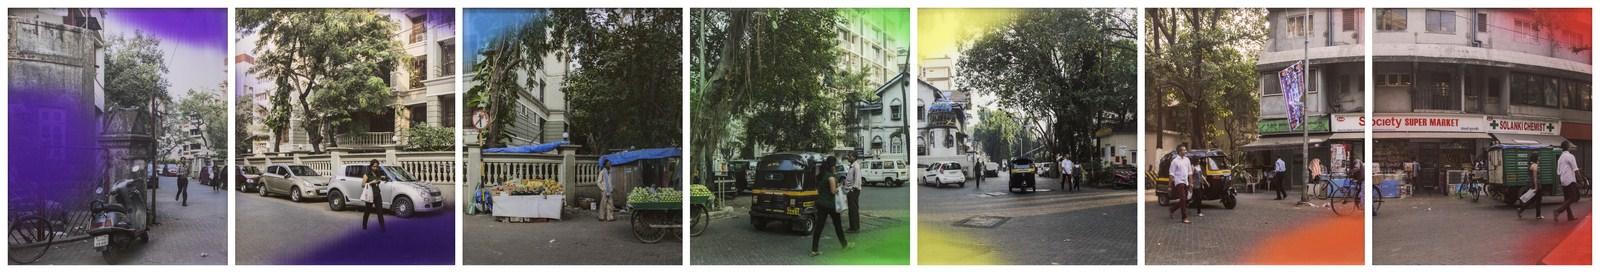 "Jitish Kallat | Event Horizon | Lenticular prints | 44"" x 38.25"" (Each) | 2014 | Set of 7"